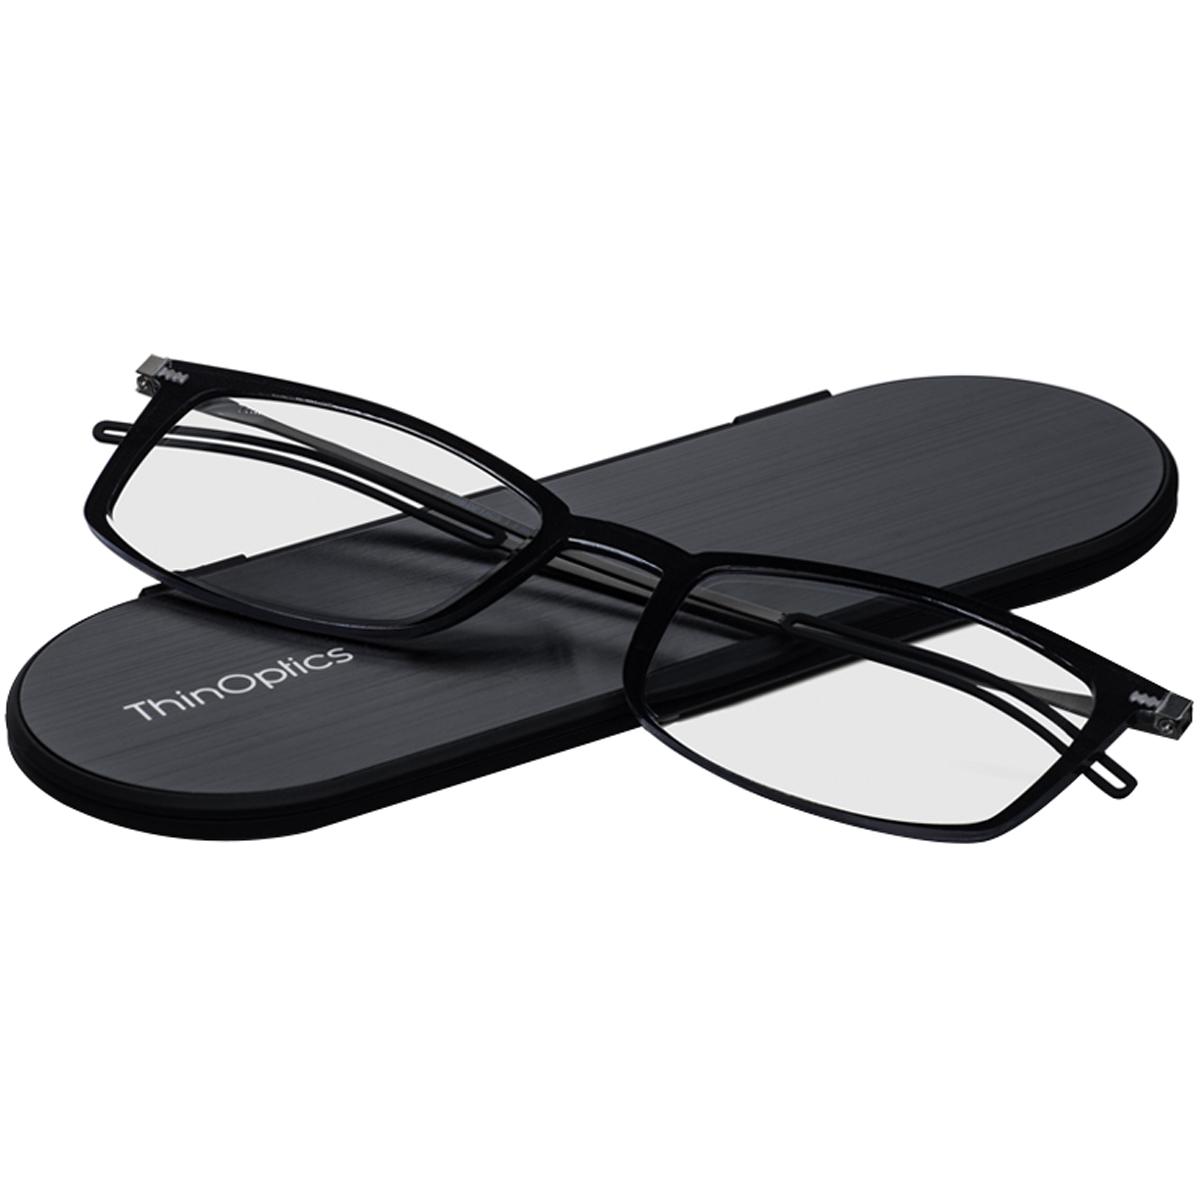 thumbnail 3 - ThinOptics FrontPage Brooklyn Reading Glasses with Milano Case